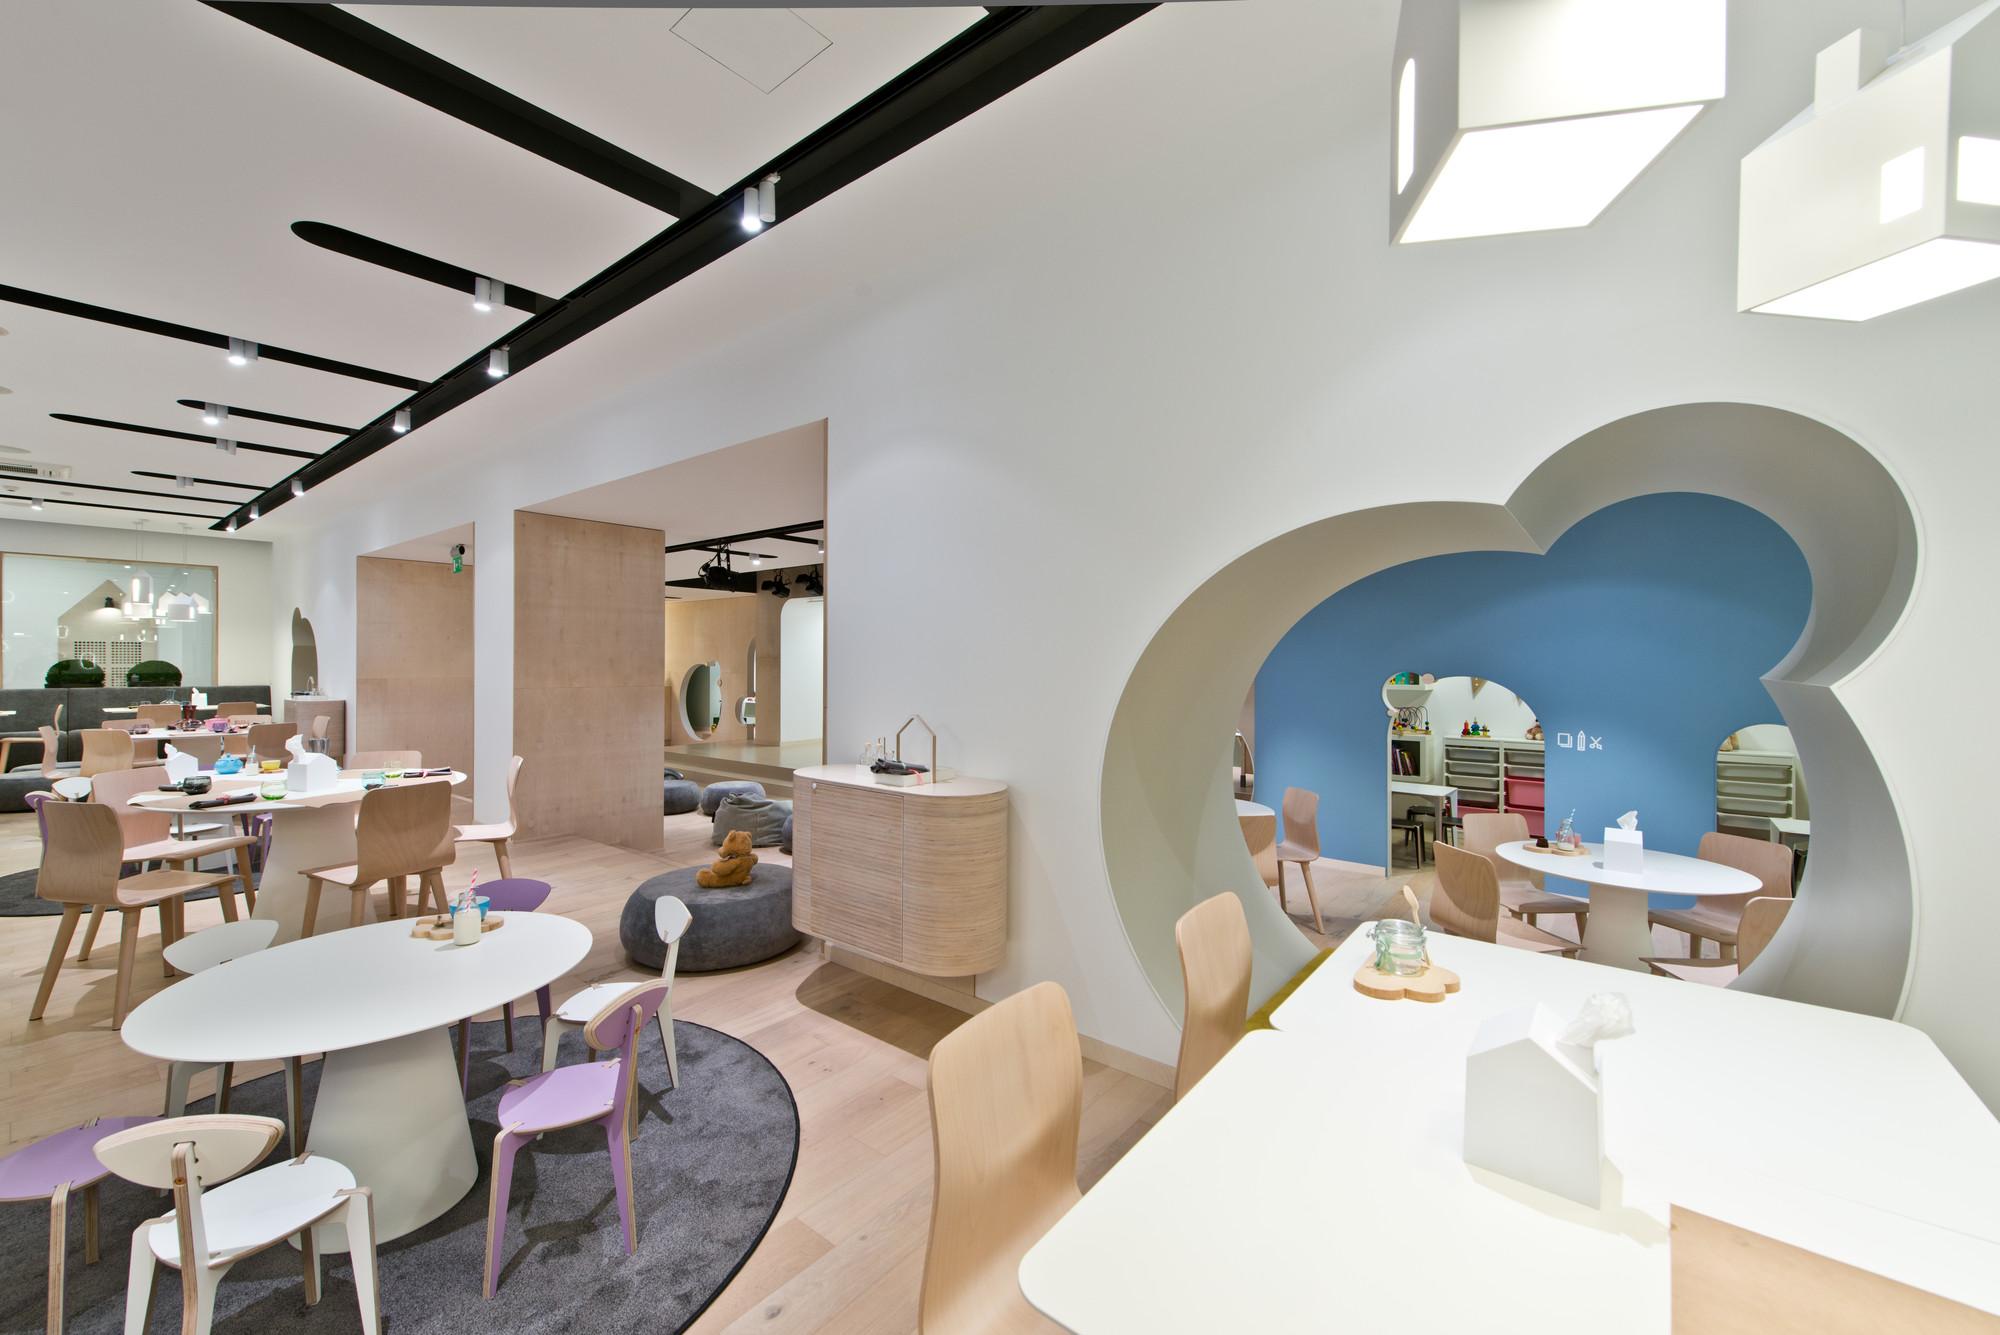 gallery of kukumuku plazma architecture studio 10. Black Bedroom Furniture Sets. Home Design Ideas